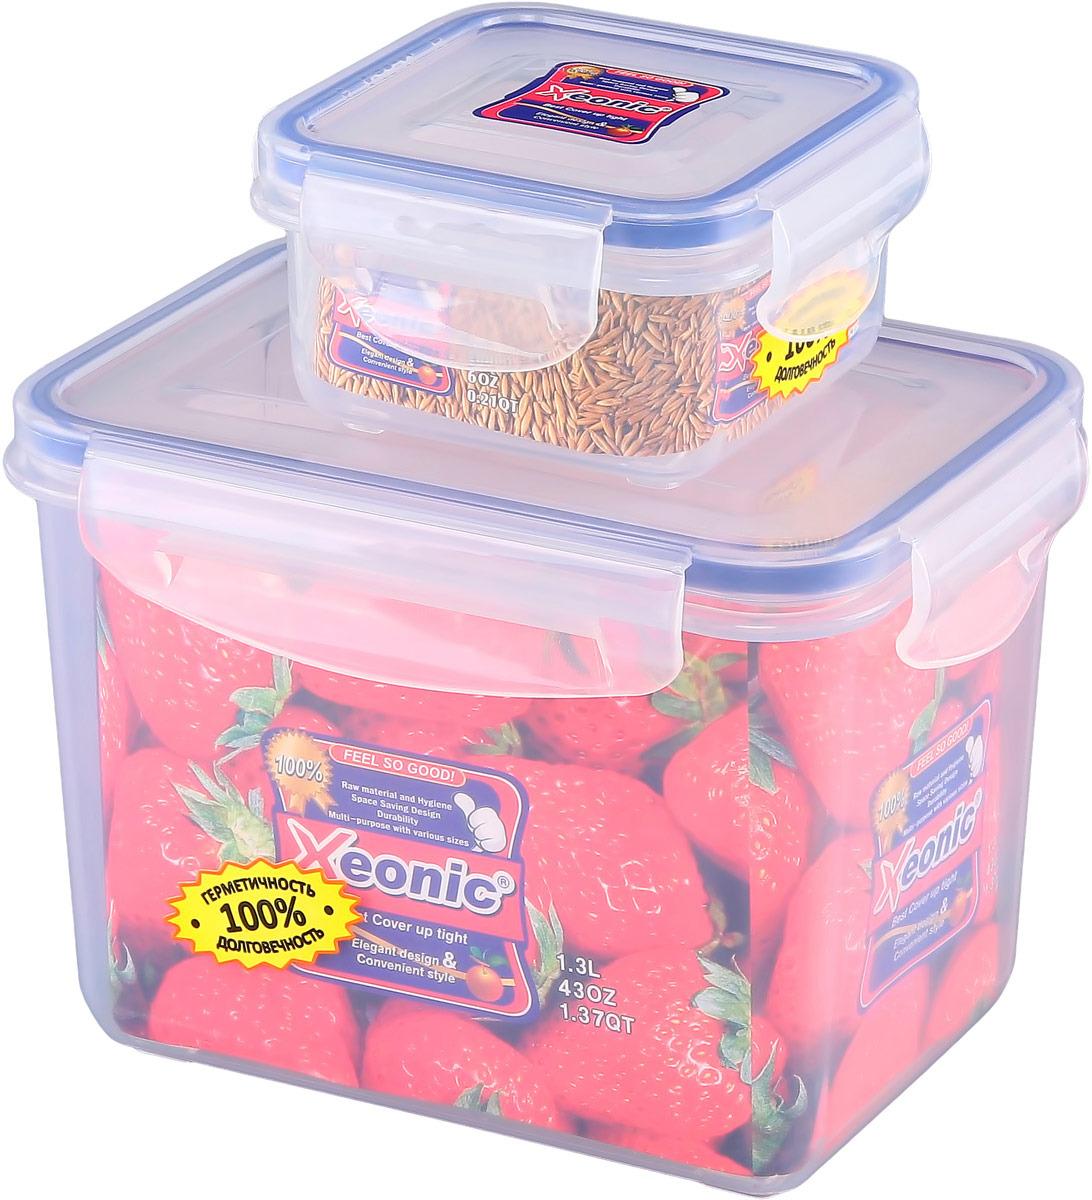 Набор контейнеров Xeonic, 2 предмета. 810835